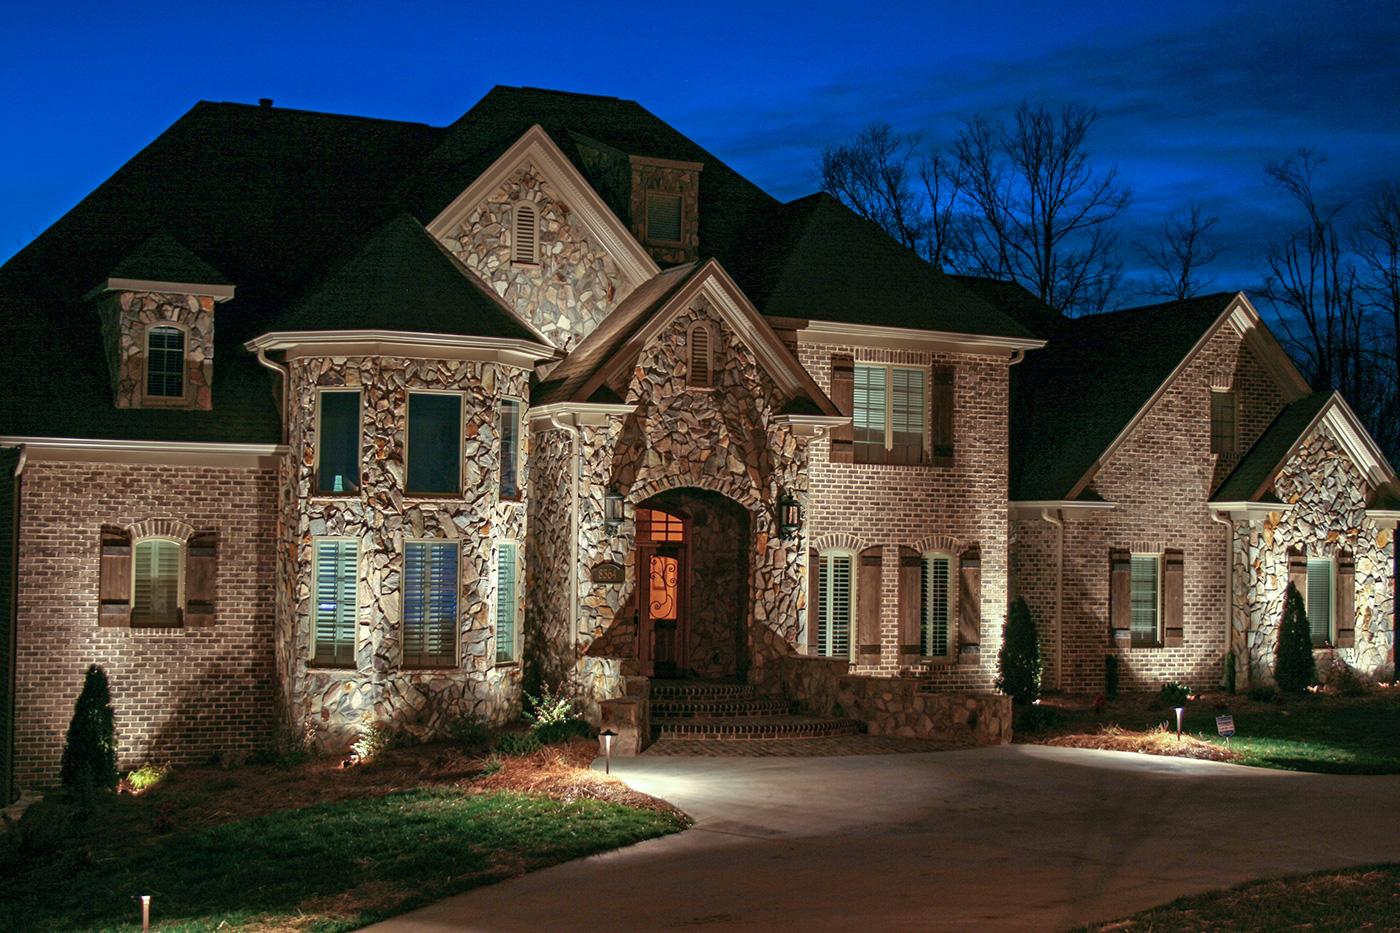 Control4 home lighting automation creates the idea of mockupancy